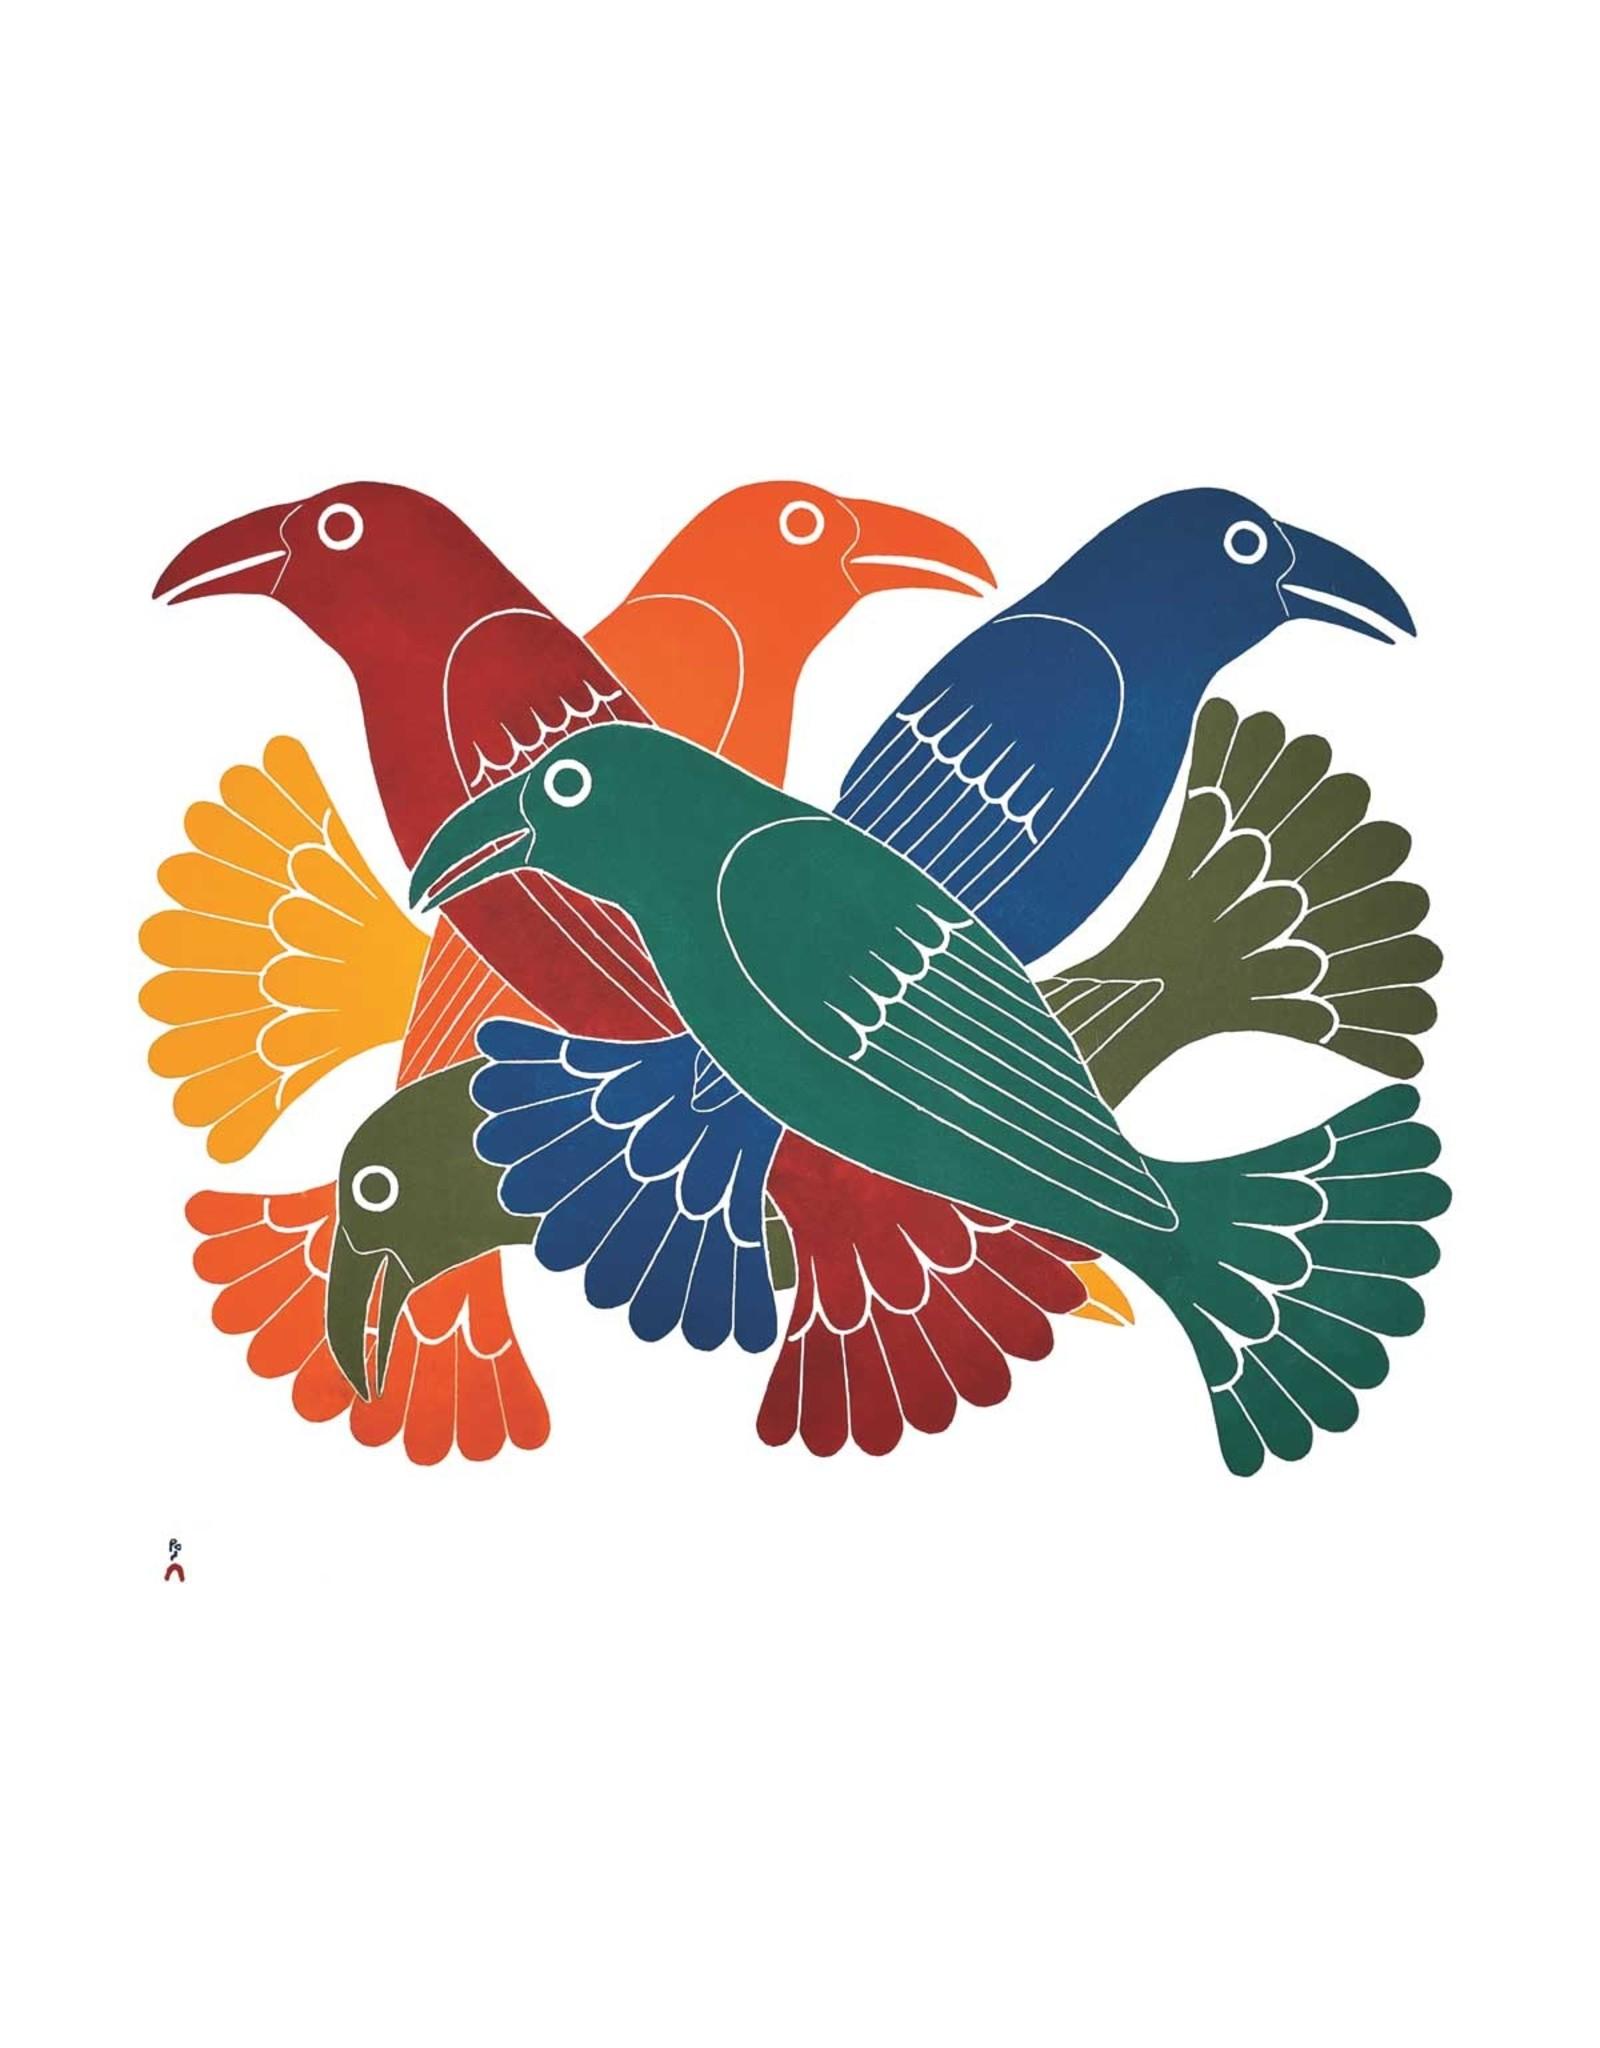 Spectacular Ravens by Kenojuak Ashevak Card